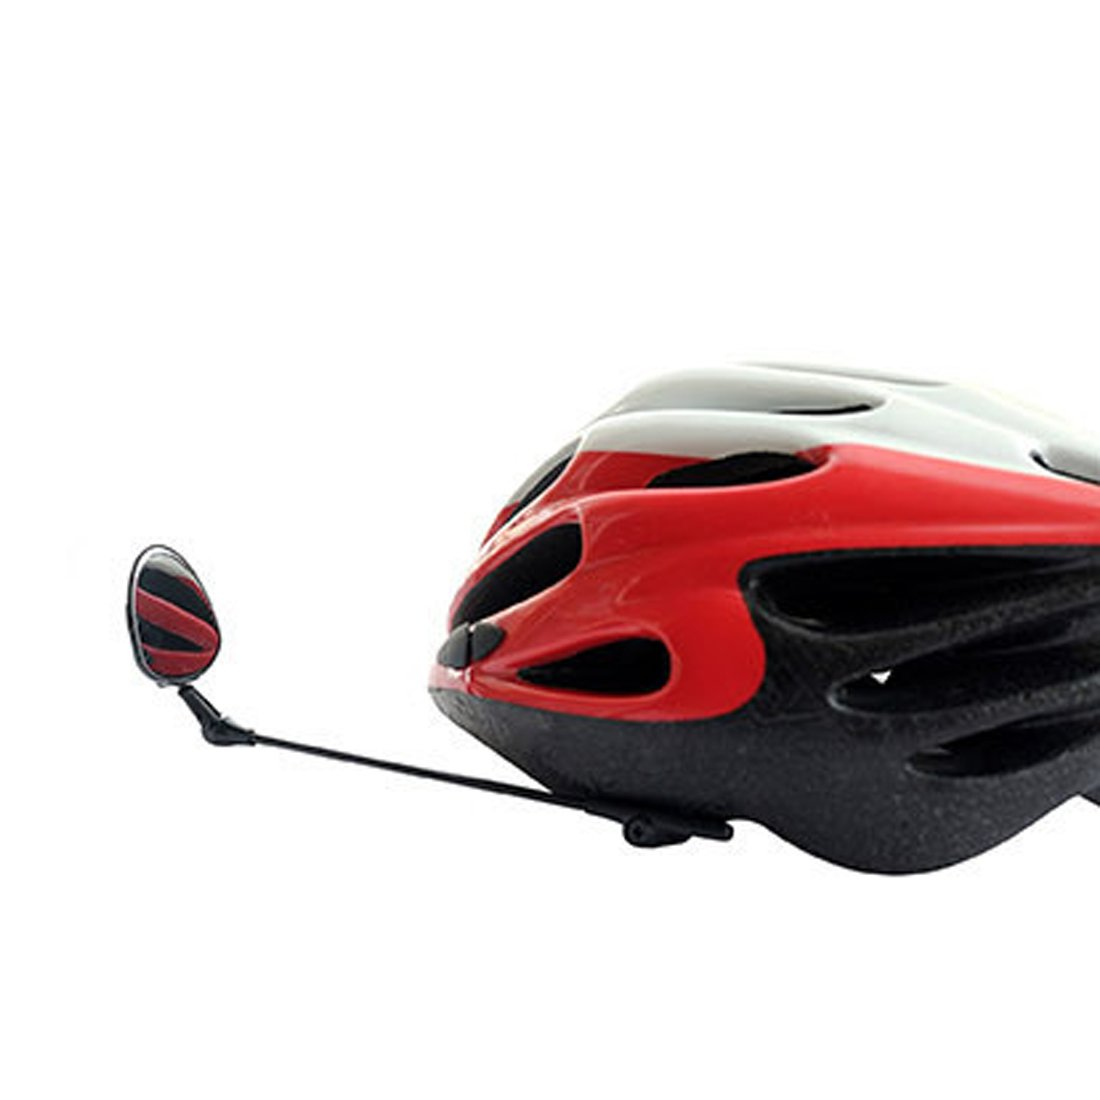 ZENUTA Espejo retrovisor para bicicleta giratorio 360° Espejo para casco espejo ajustable con buena visibilidad para bicicleta y moto